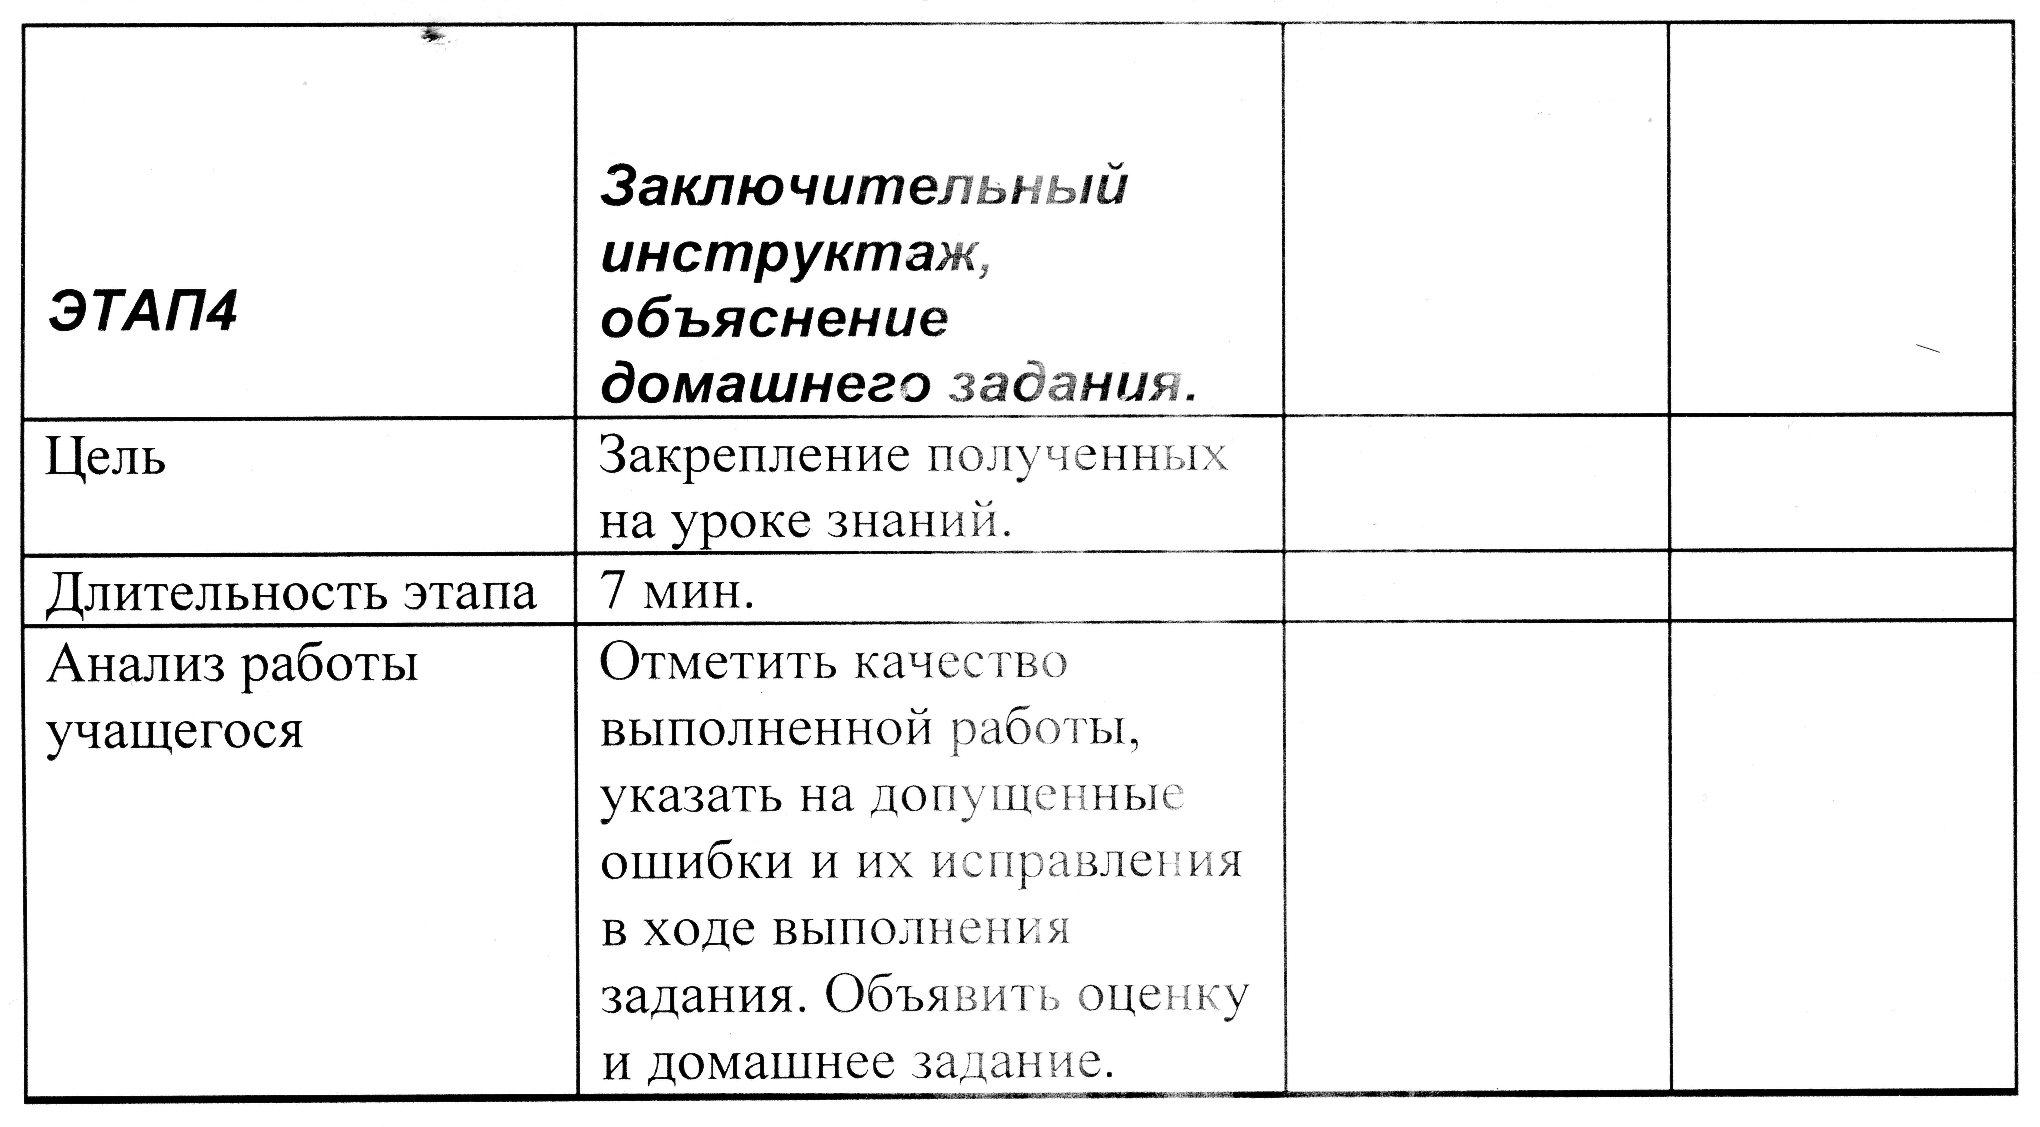 C:\Users\Василий Мельченко\Pictures\img627.jpg